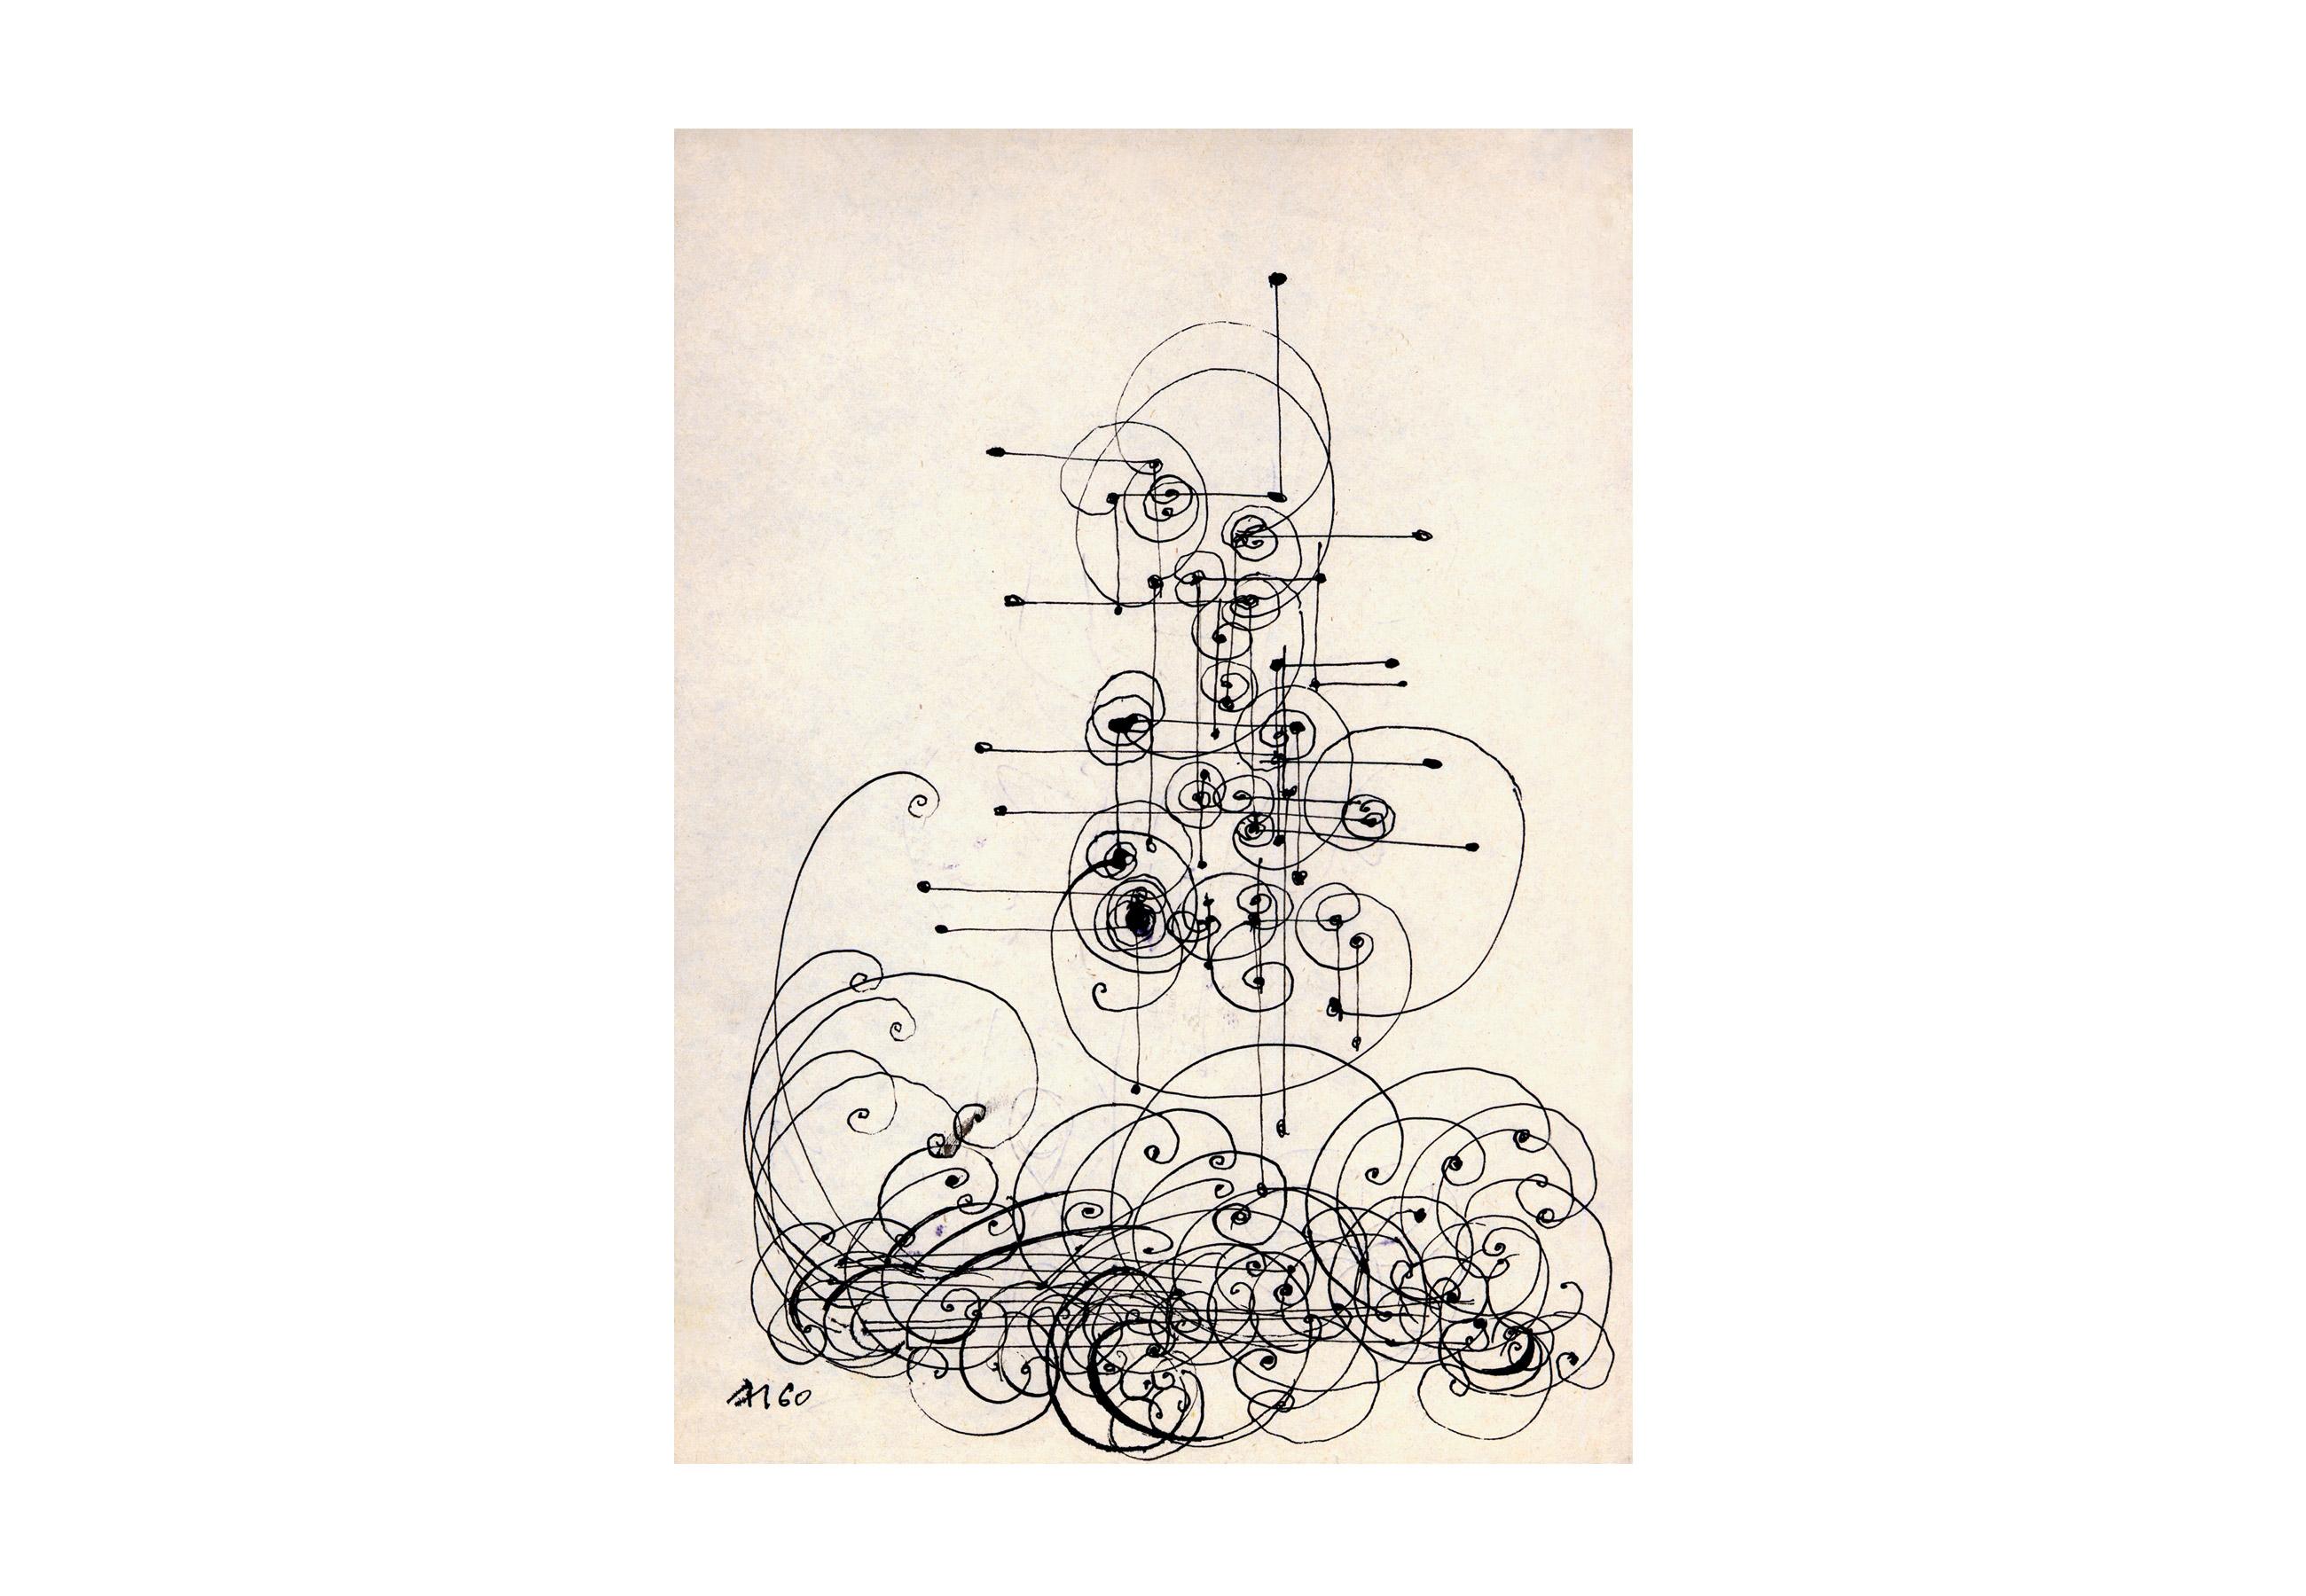 Lamm-Portfolio-1960-69-08.jpg